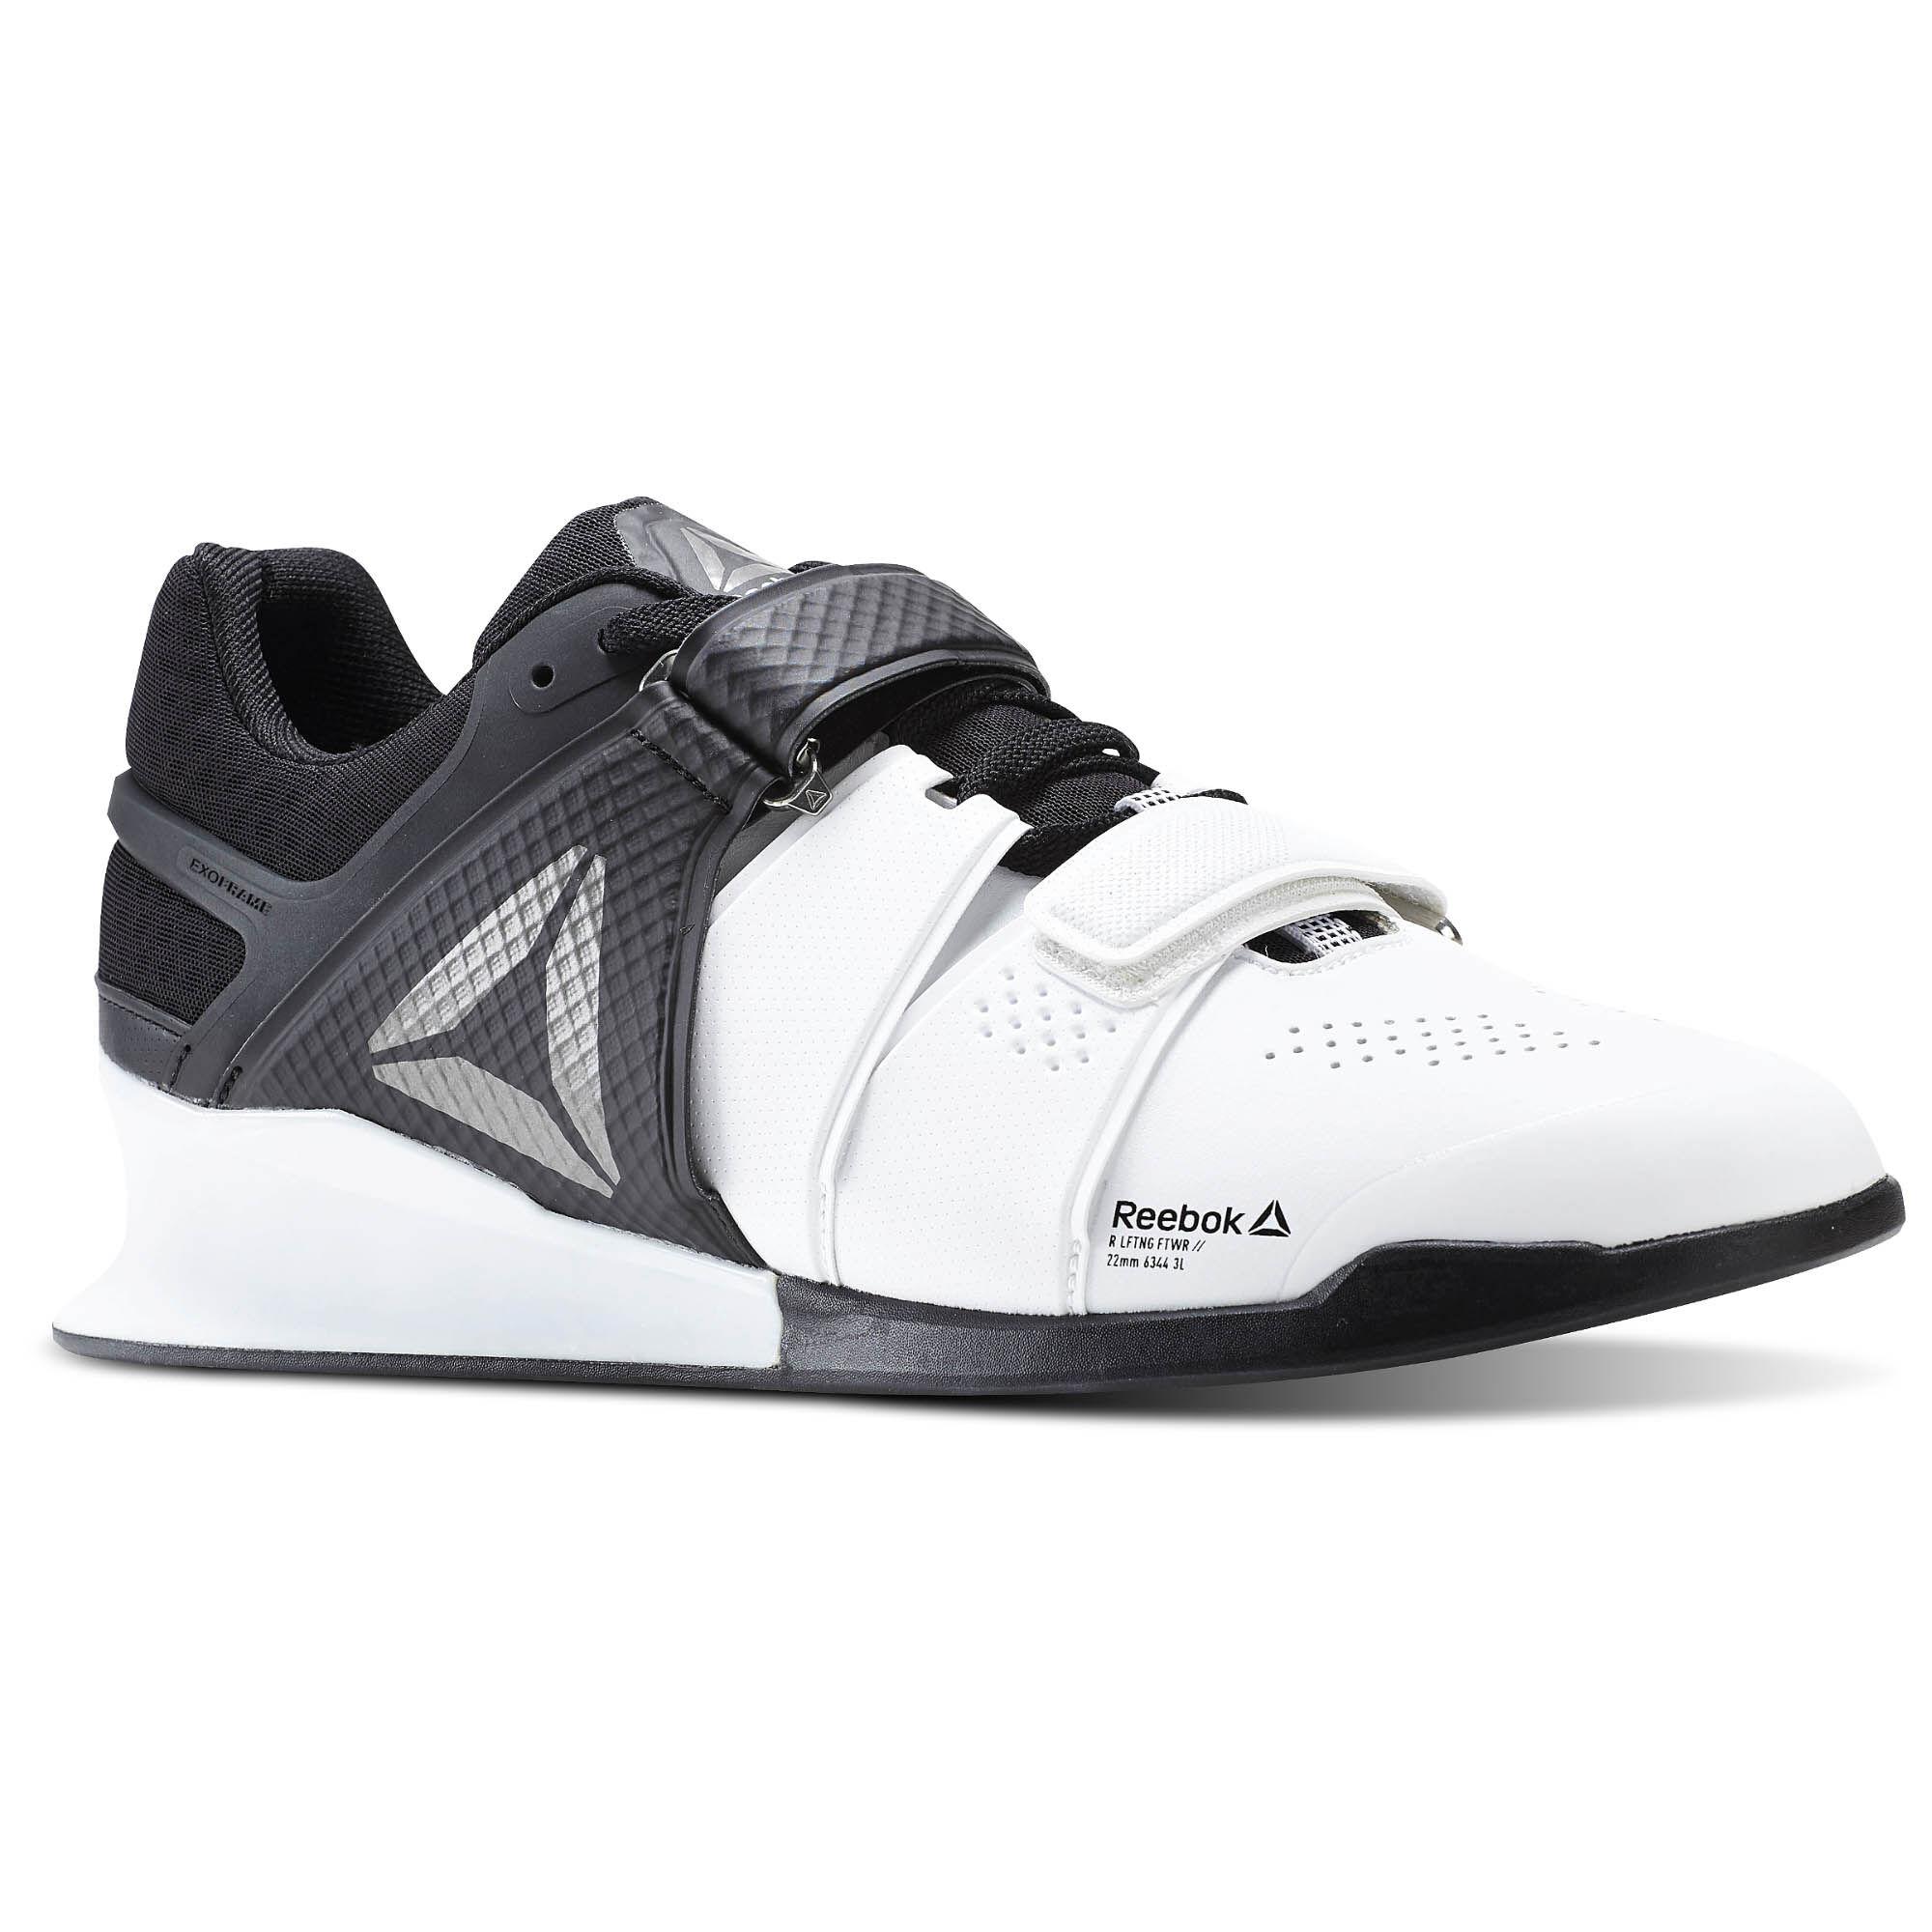 Reebok Black Velcro Shoes